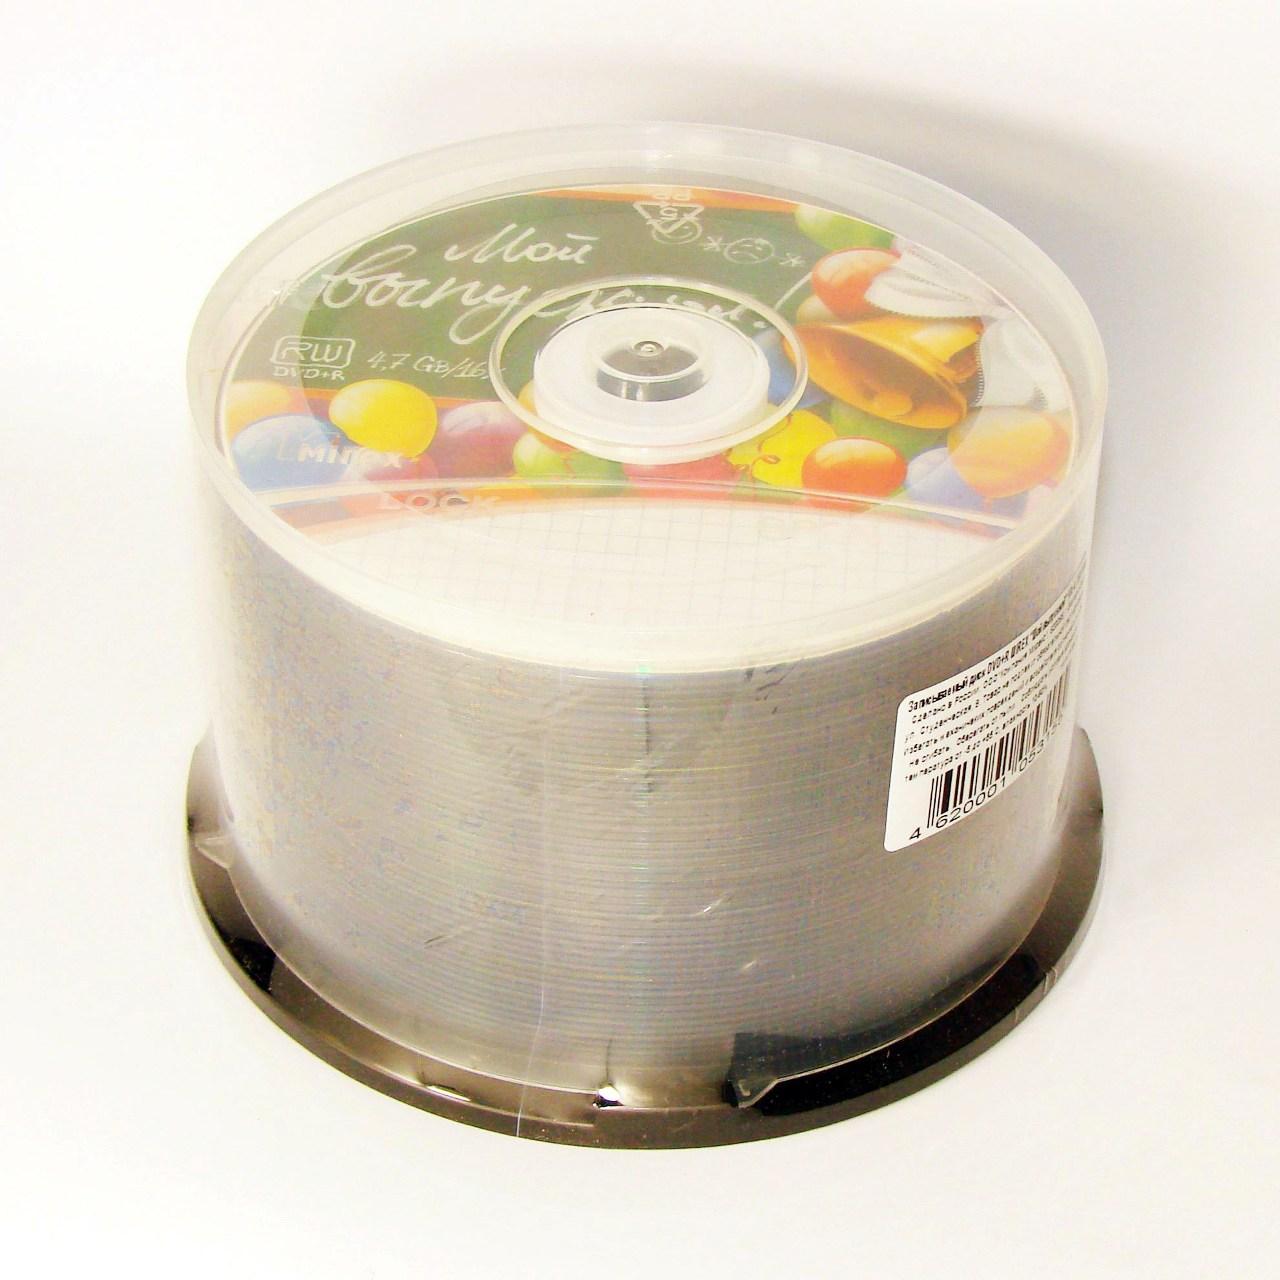 12 Dvd R Cd Rw 12x Ritek Excellent Bulk 50 16 Mirex Cake Box